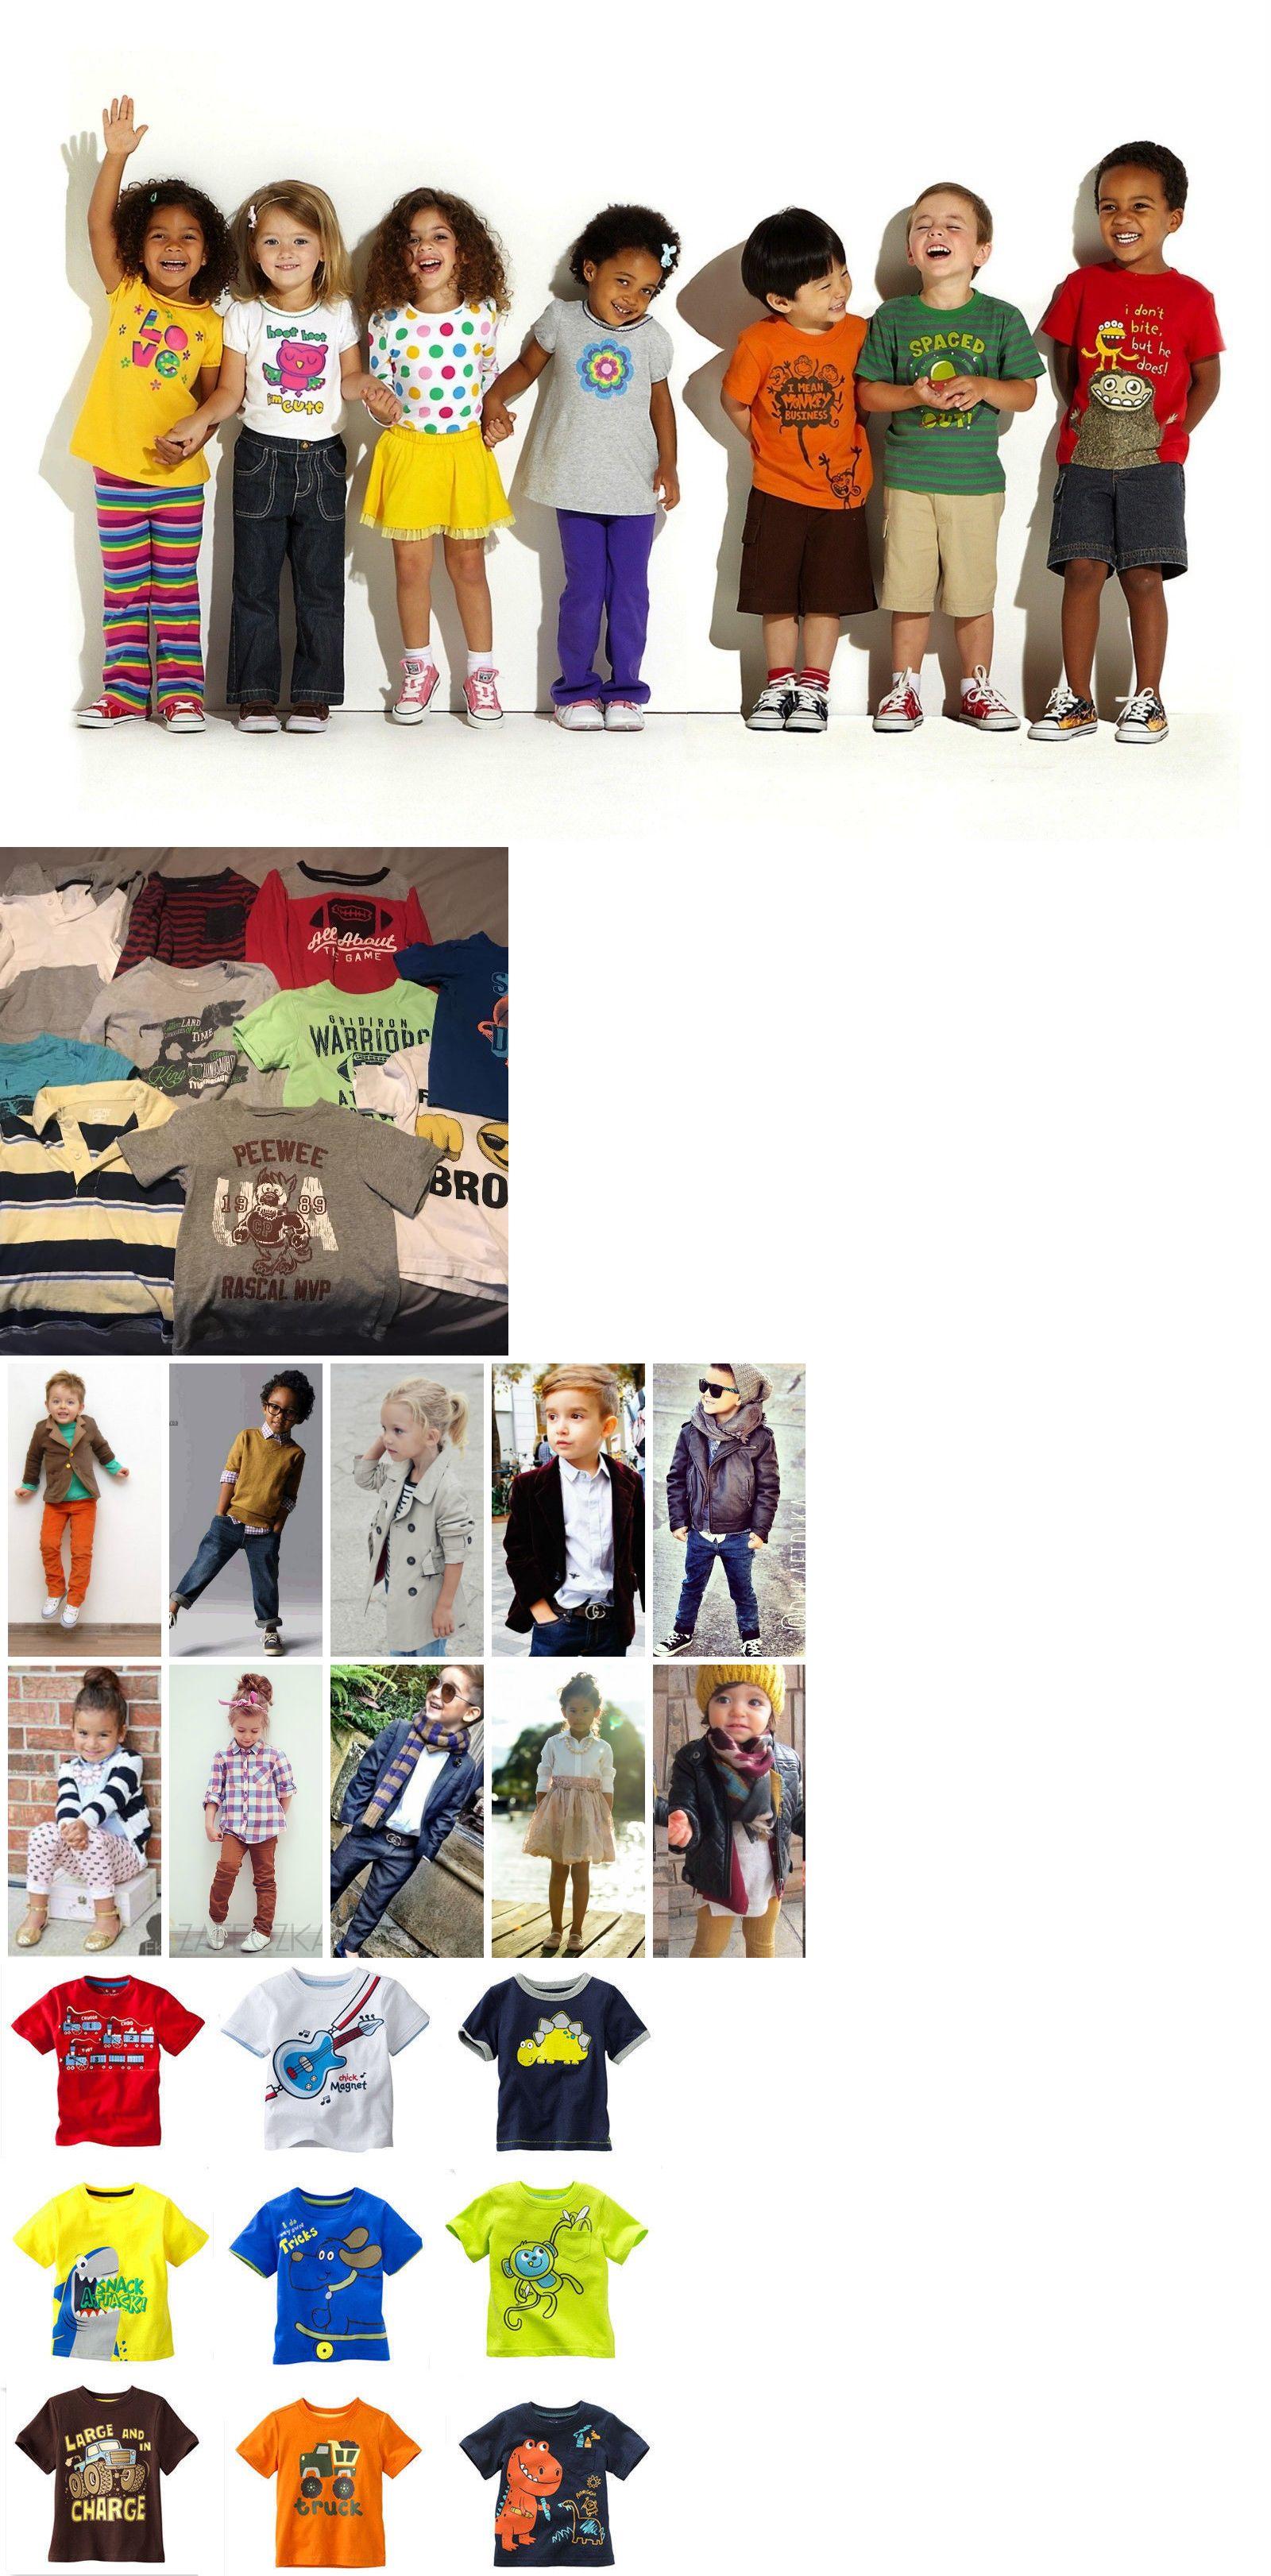 NEW Wholesale LOT 50 Pcs Mixed Kids Children Boys T shirts Neck ties Clothing